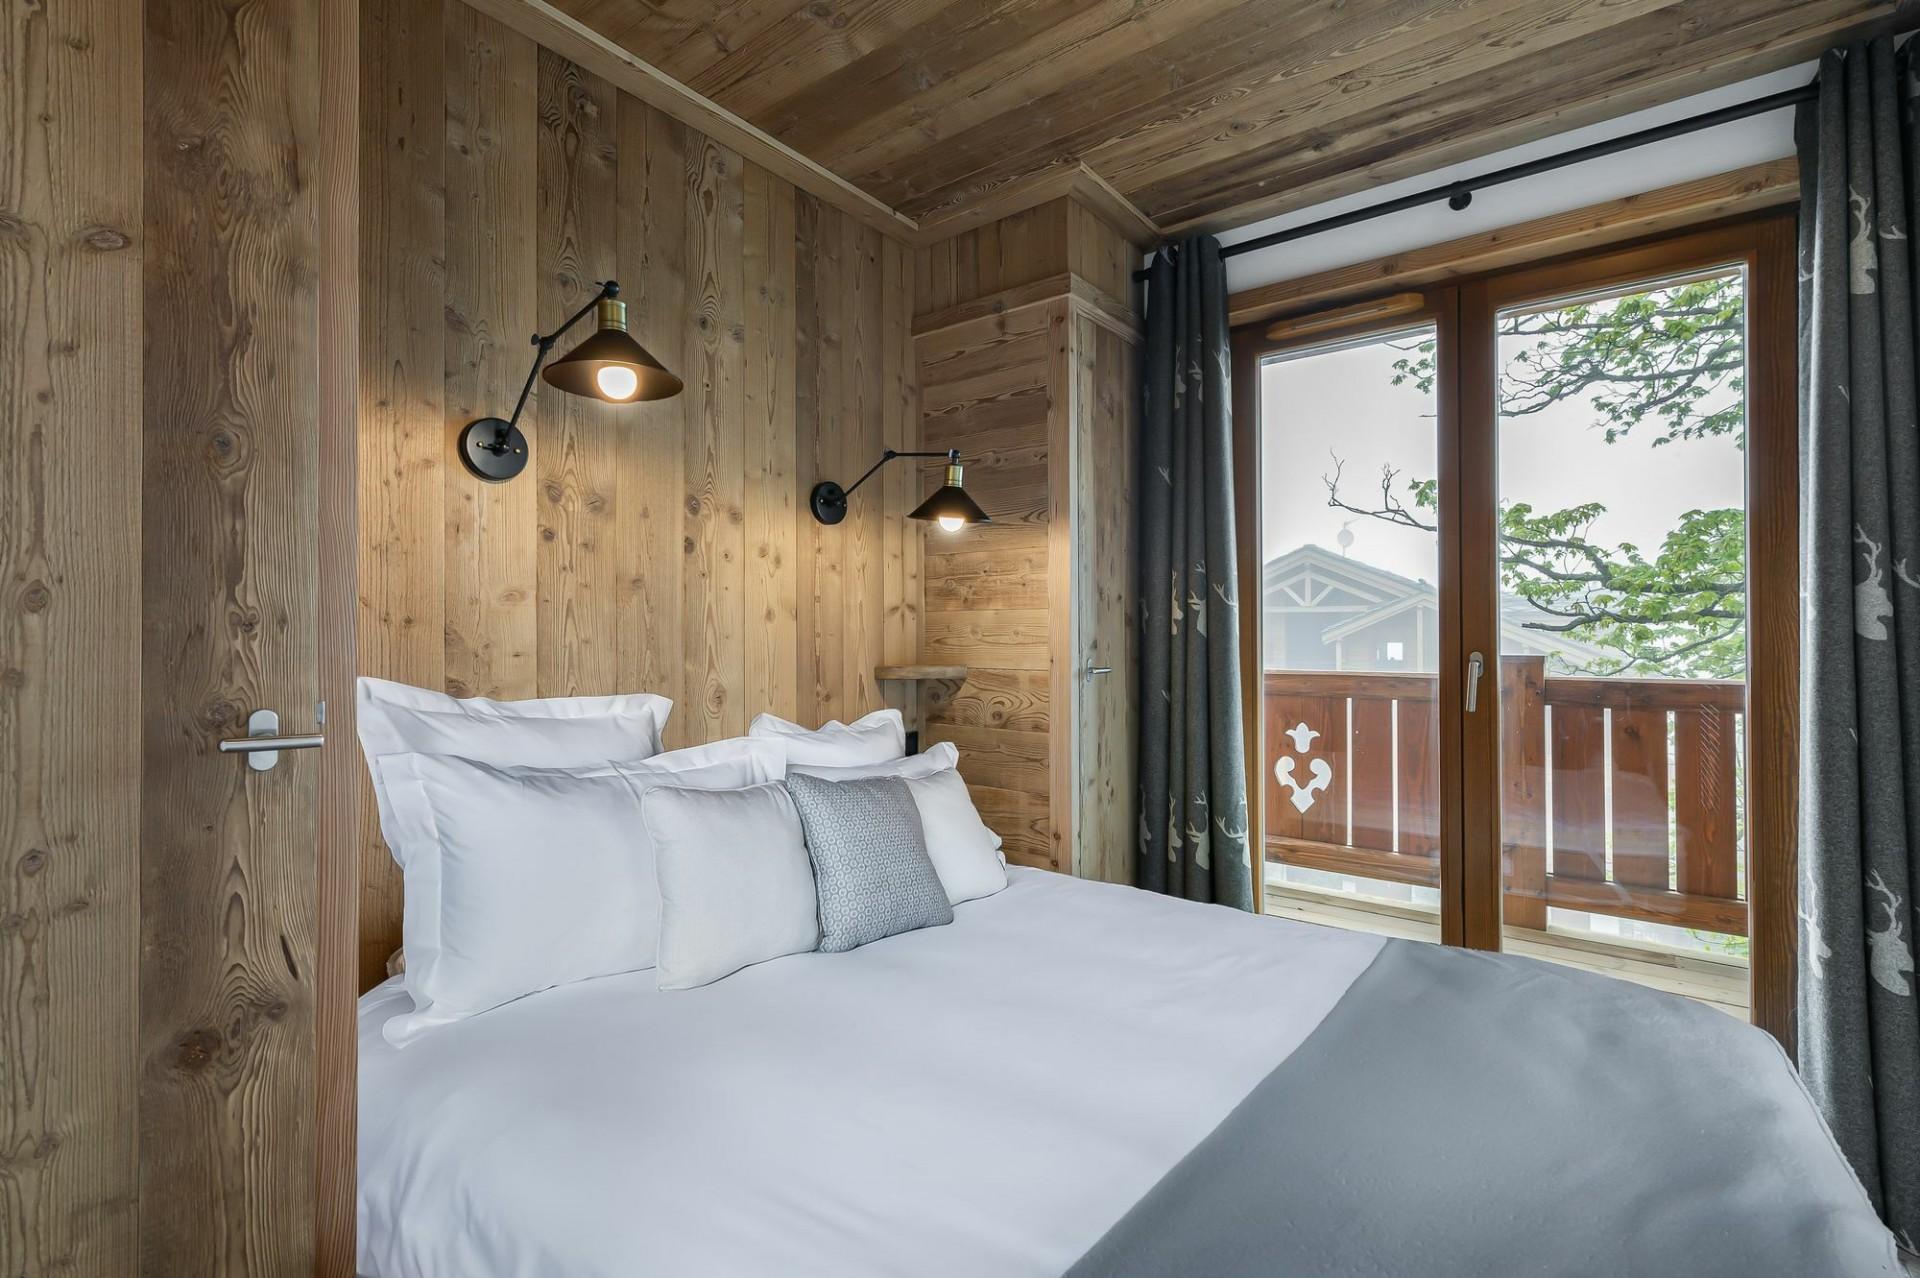 Courchevel 1300 Location Appartement Luxe Tilante Chambre 3